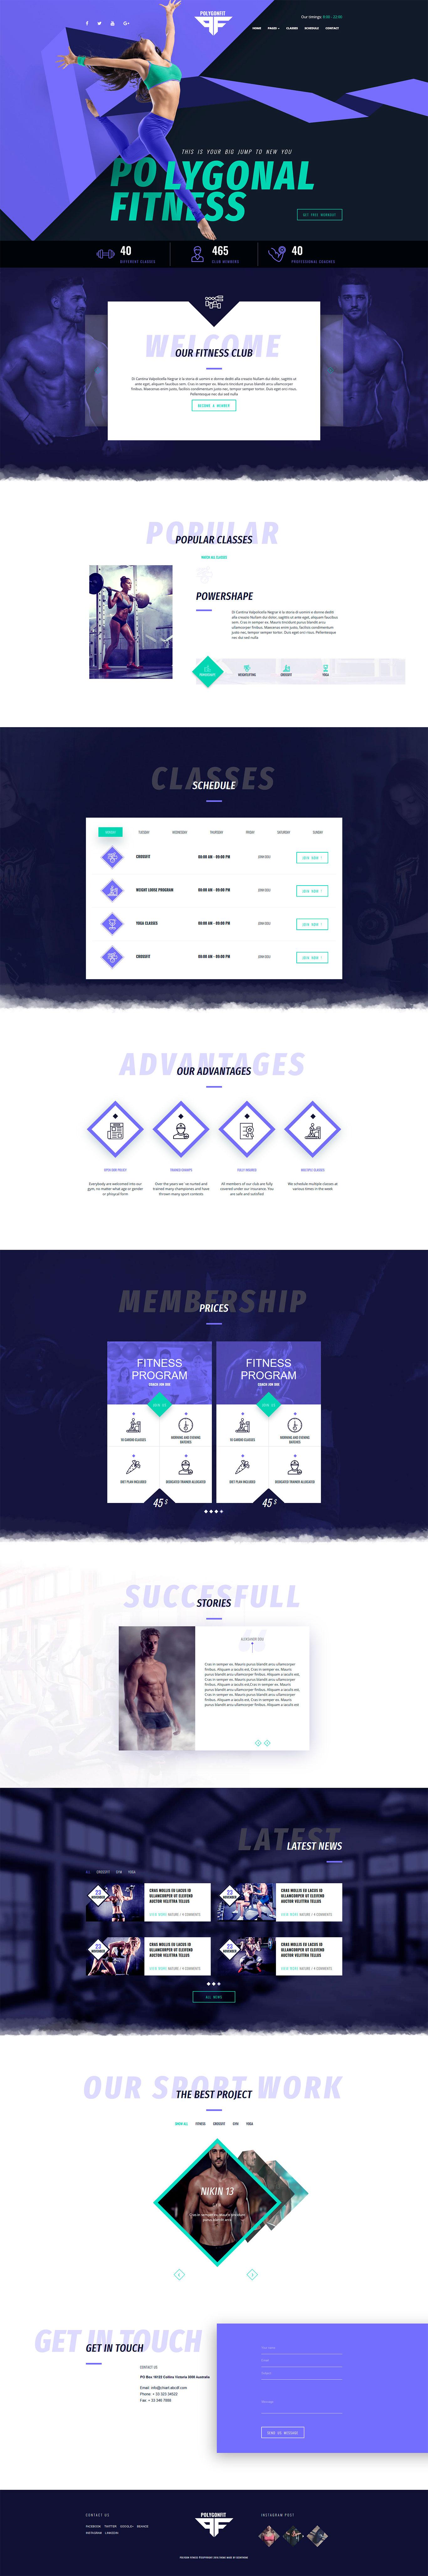 Создание шаблонов сайта на Envato